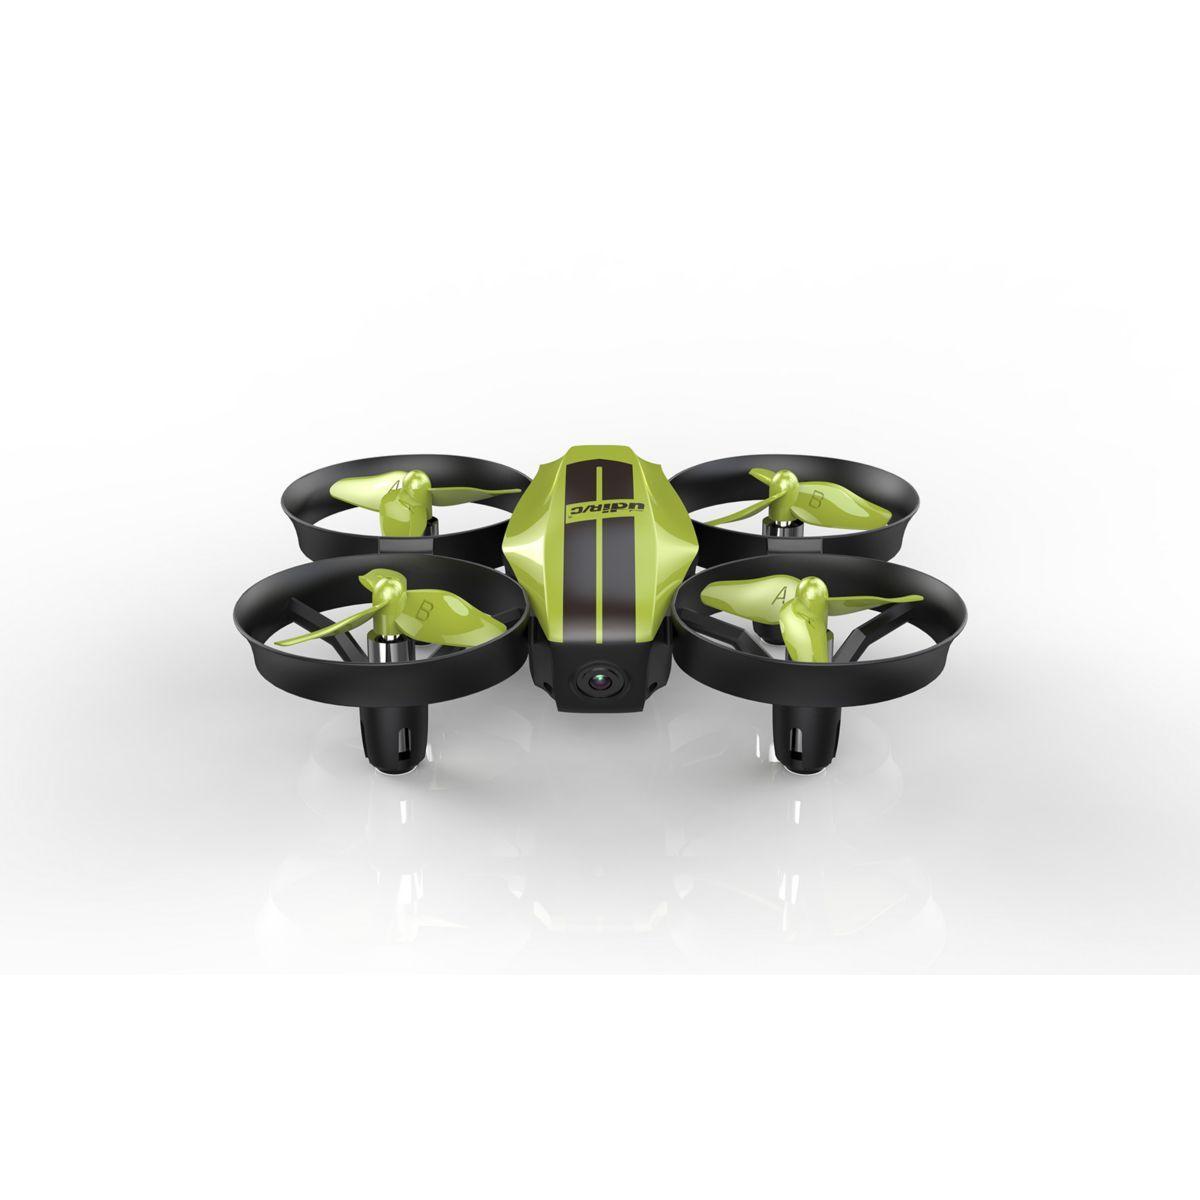 Drones udi rc firefly (photo)